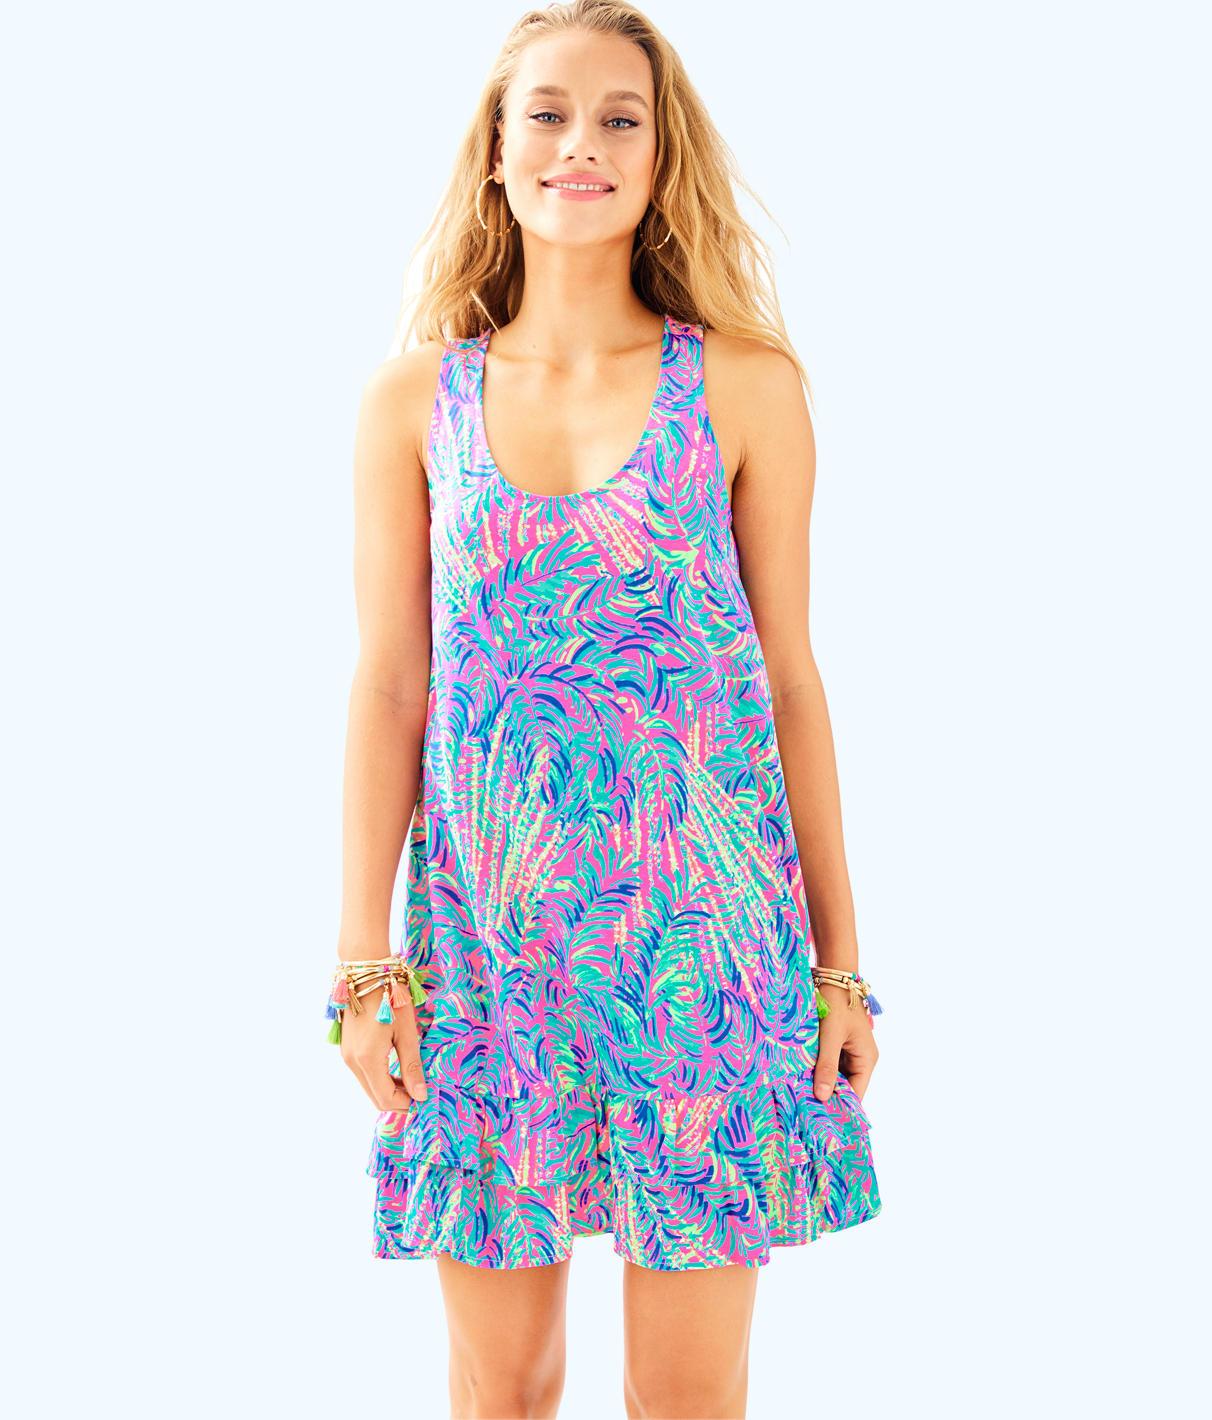 Lilly Pulitzer Lilly Pulitzer Womens Lilly Pulitzer Evangelia Dress